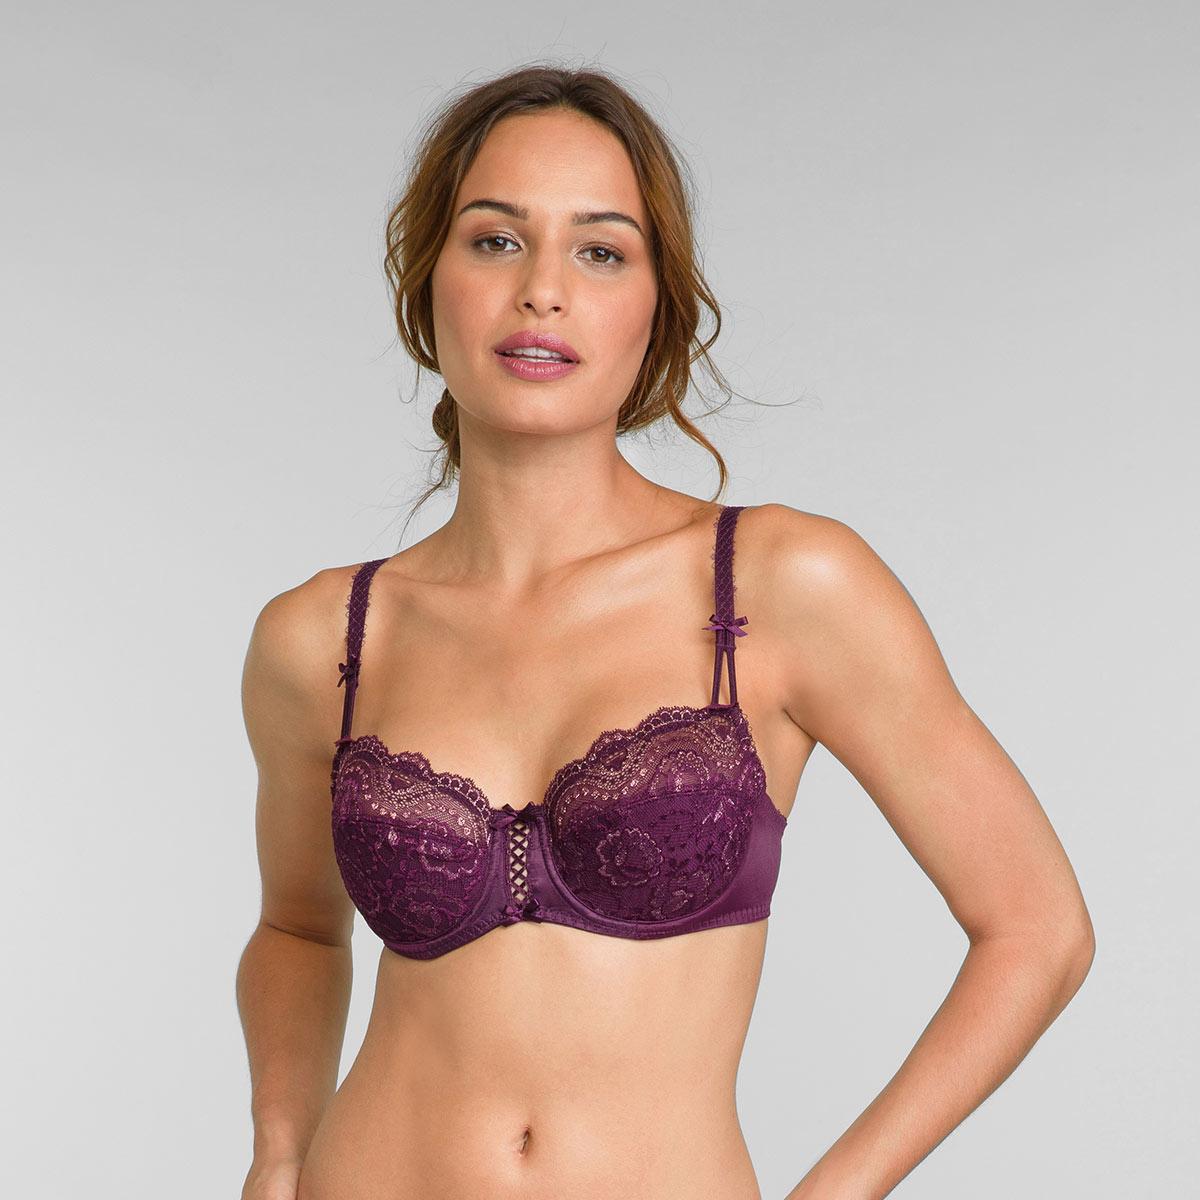 Soutien-gorge balconnet violet et doré Flower Elegance, , PLAYTEX